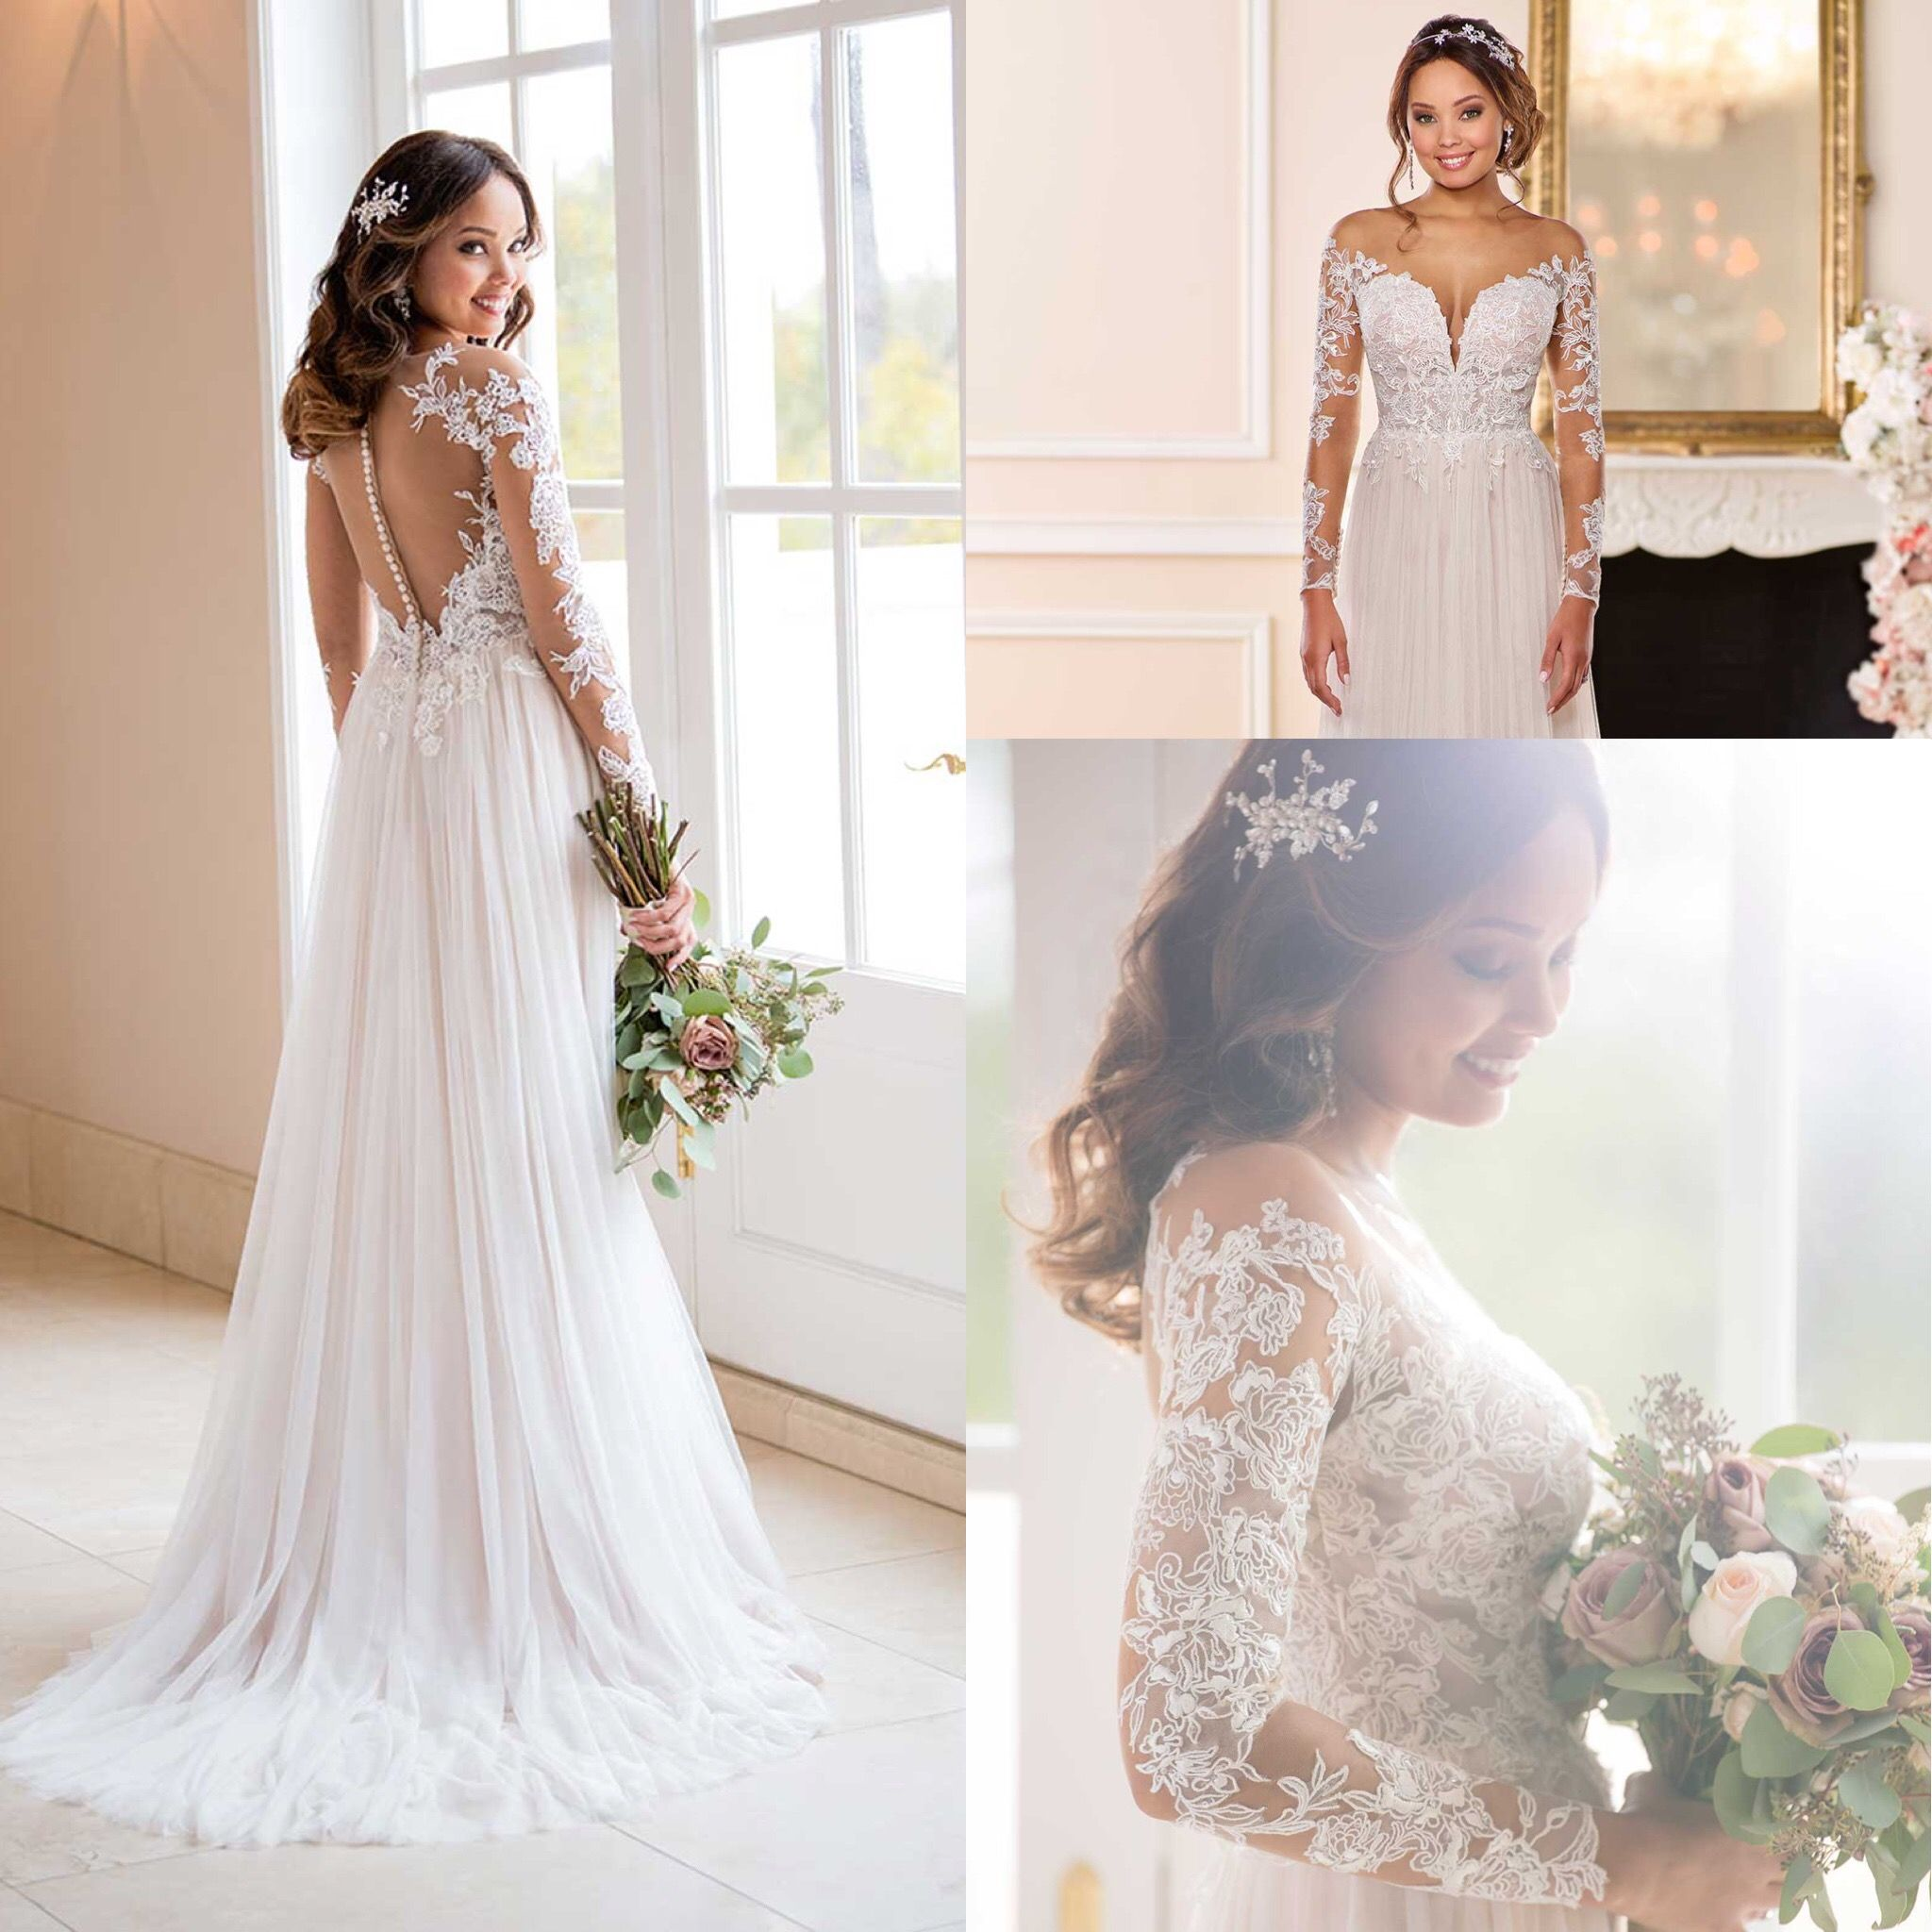 Long sleeved romantic boho tulle blush wedding dress available at